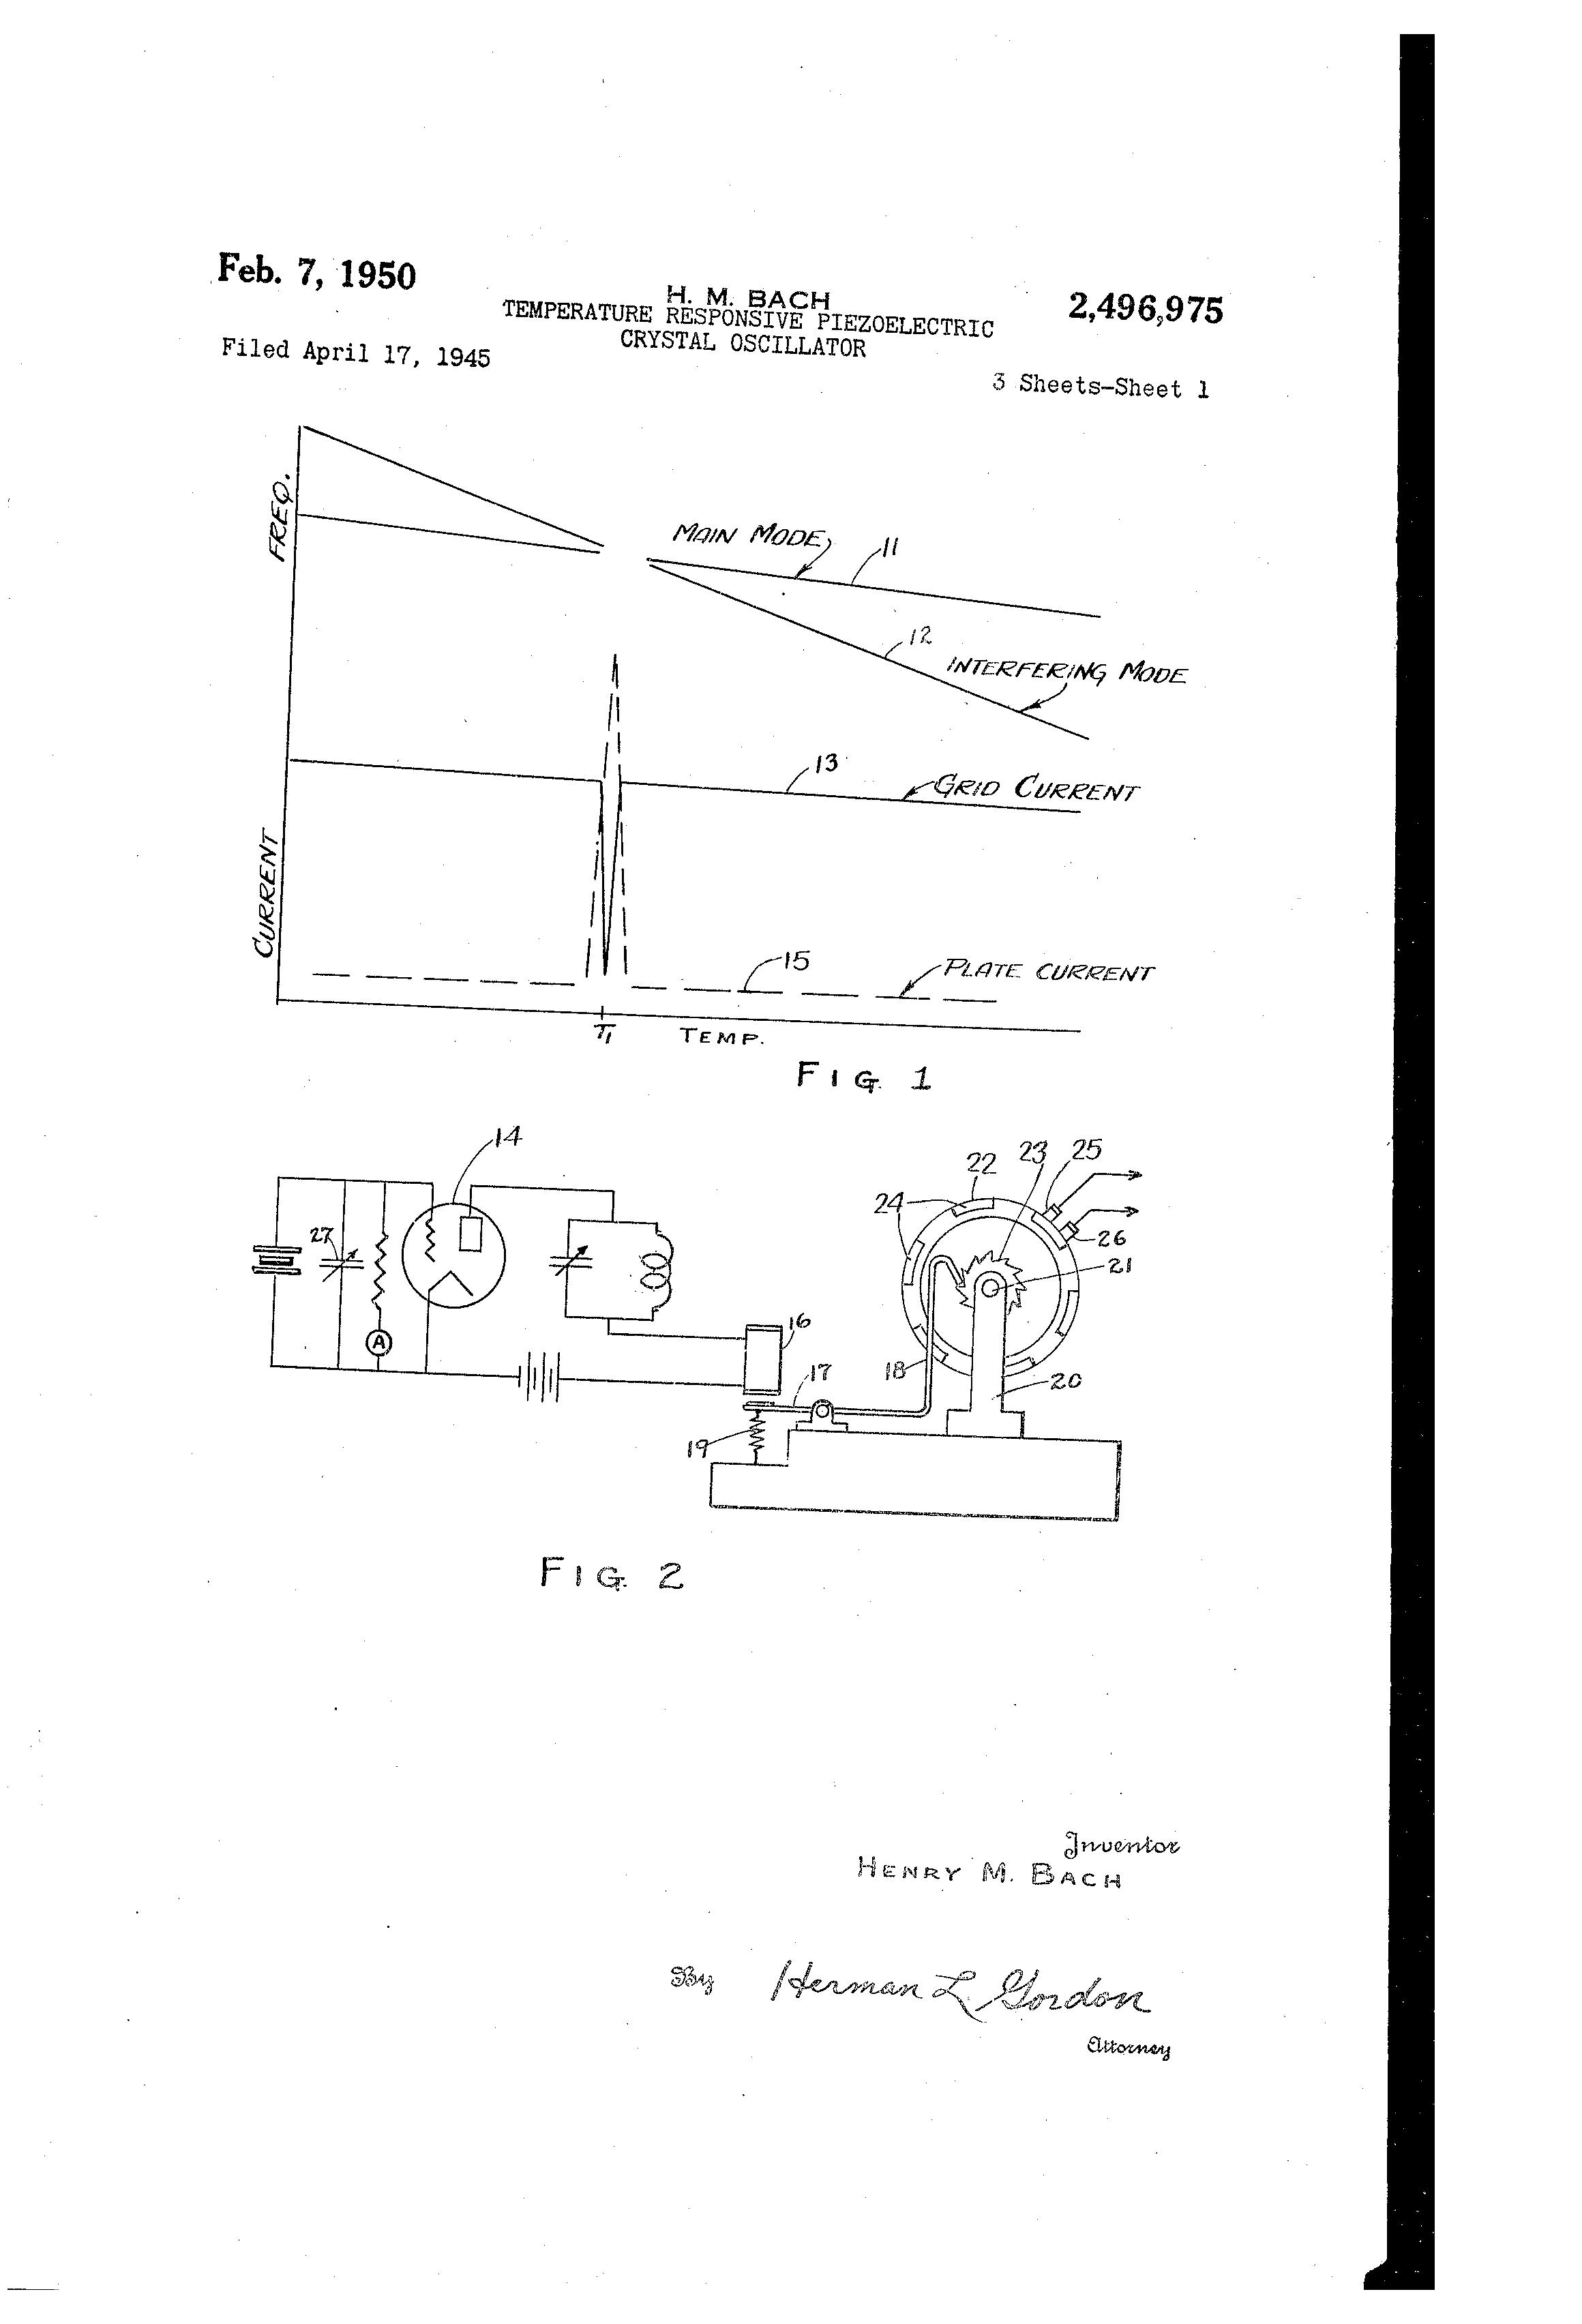 Simple Crystal Oscillator Circuit Wiring Diagram Database Fire Alarm Nonstopfree Electronic Circuits Patent Us2496975 Temperature Responsive Piezo Electric 32 Khz To 1 Hz